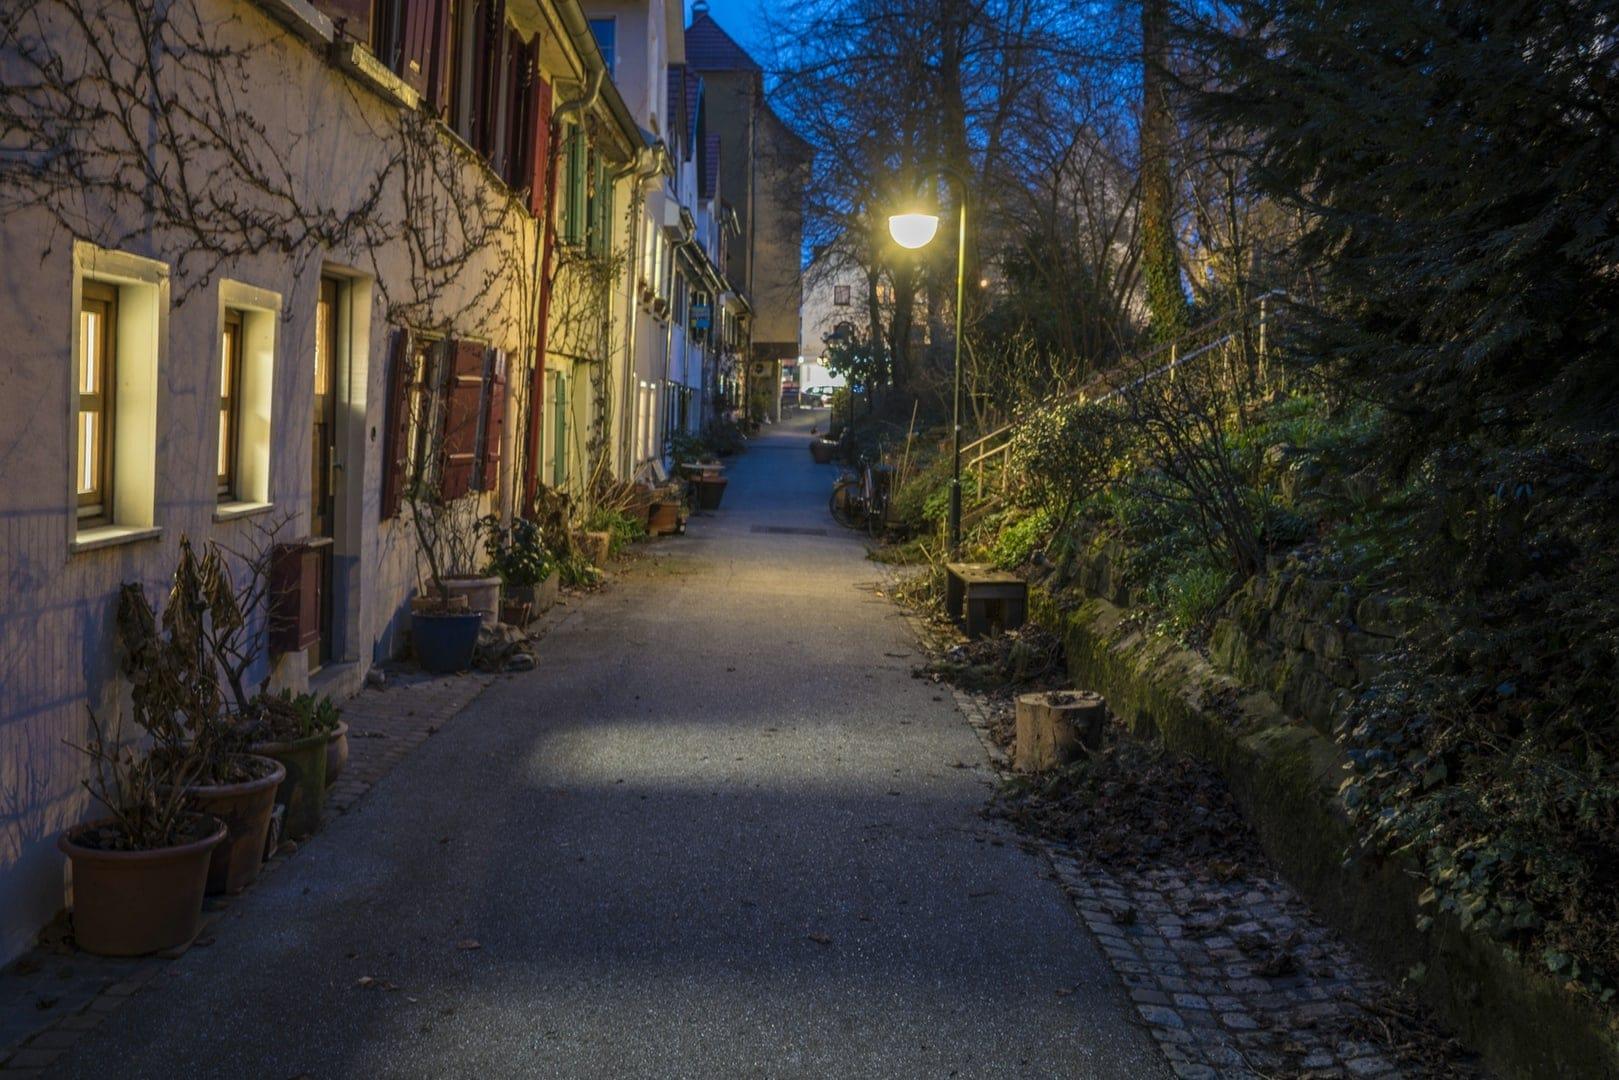 Nachtaufnahmen in Reutlingen